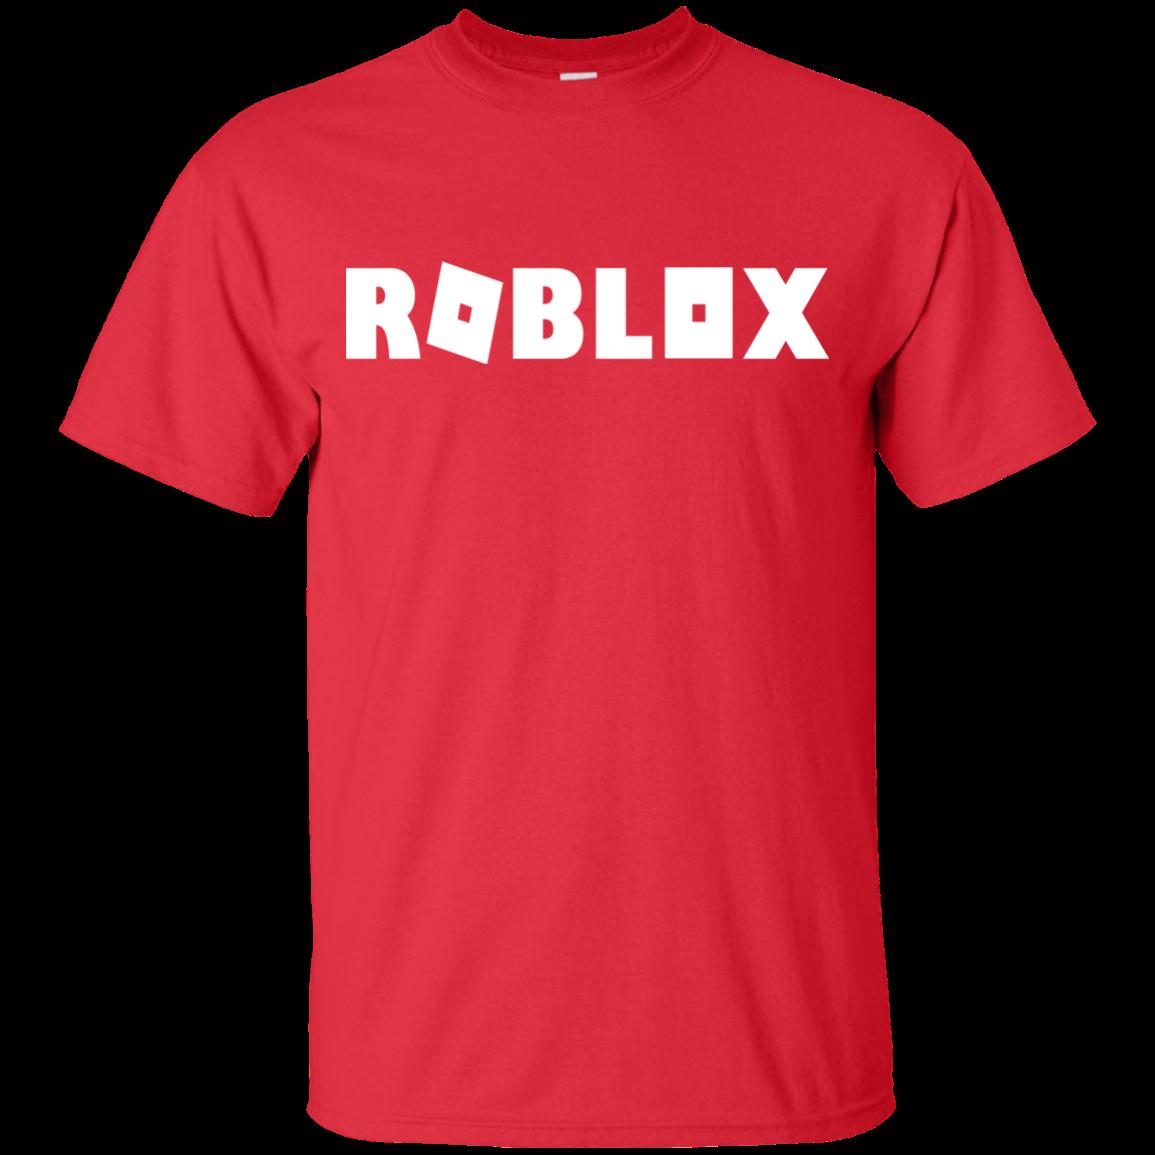 Roblox Logo White Boy\Girl Shirt Black Blue Red